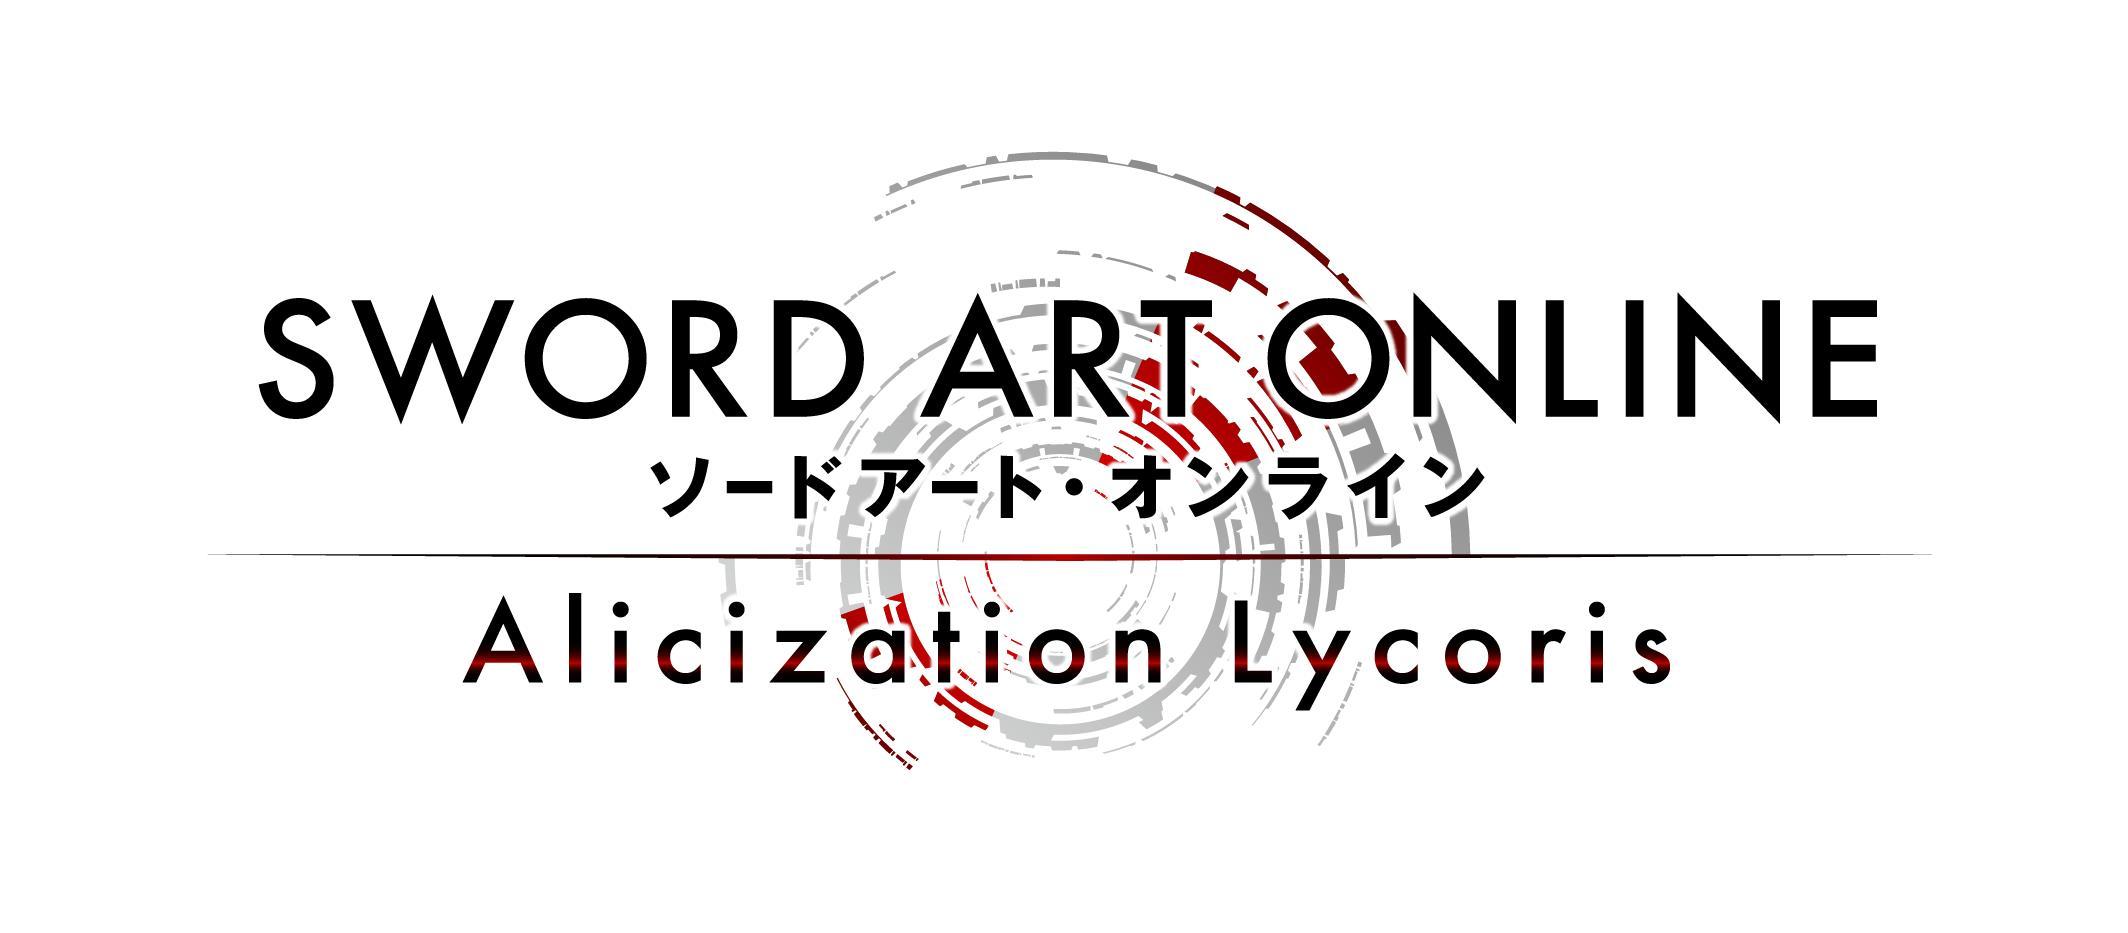 Bandai Namco annonce Sword Art Online Alicization Lycoris